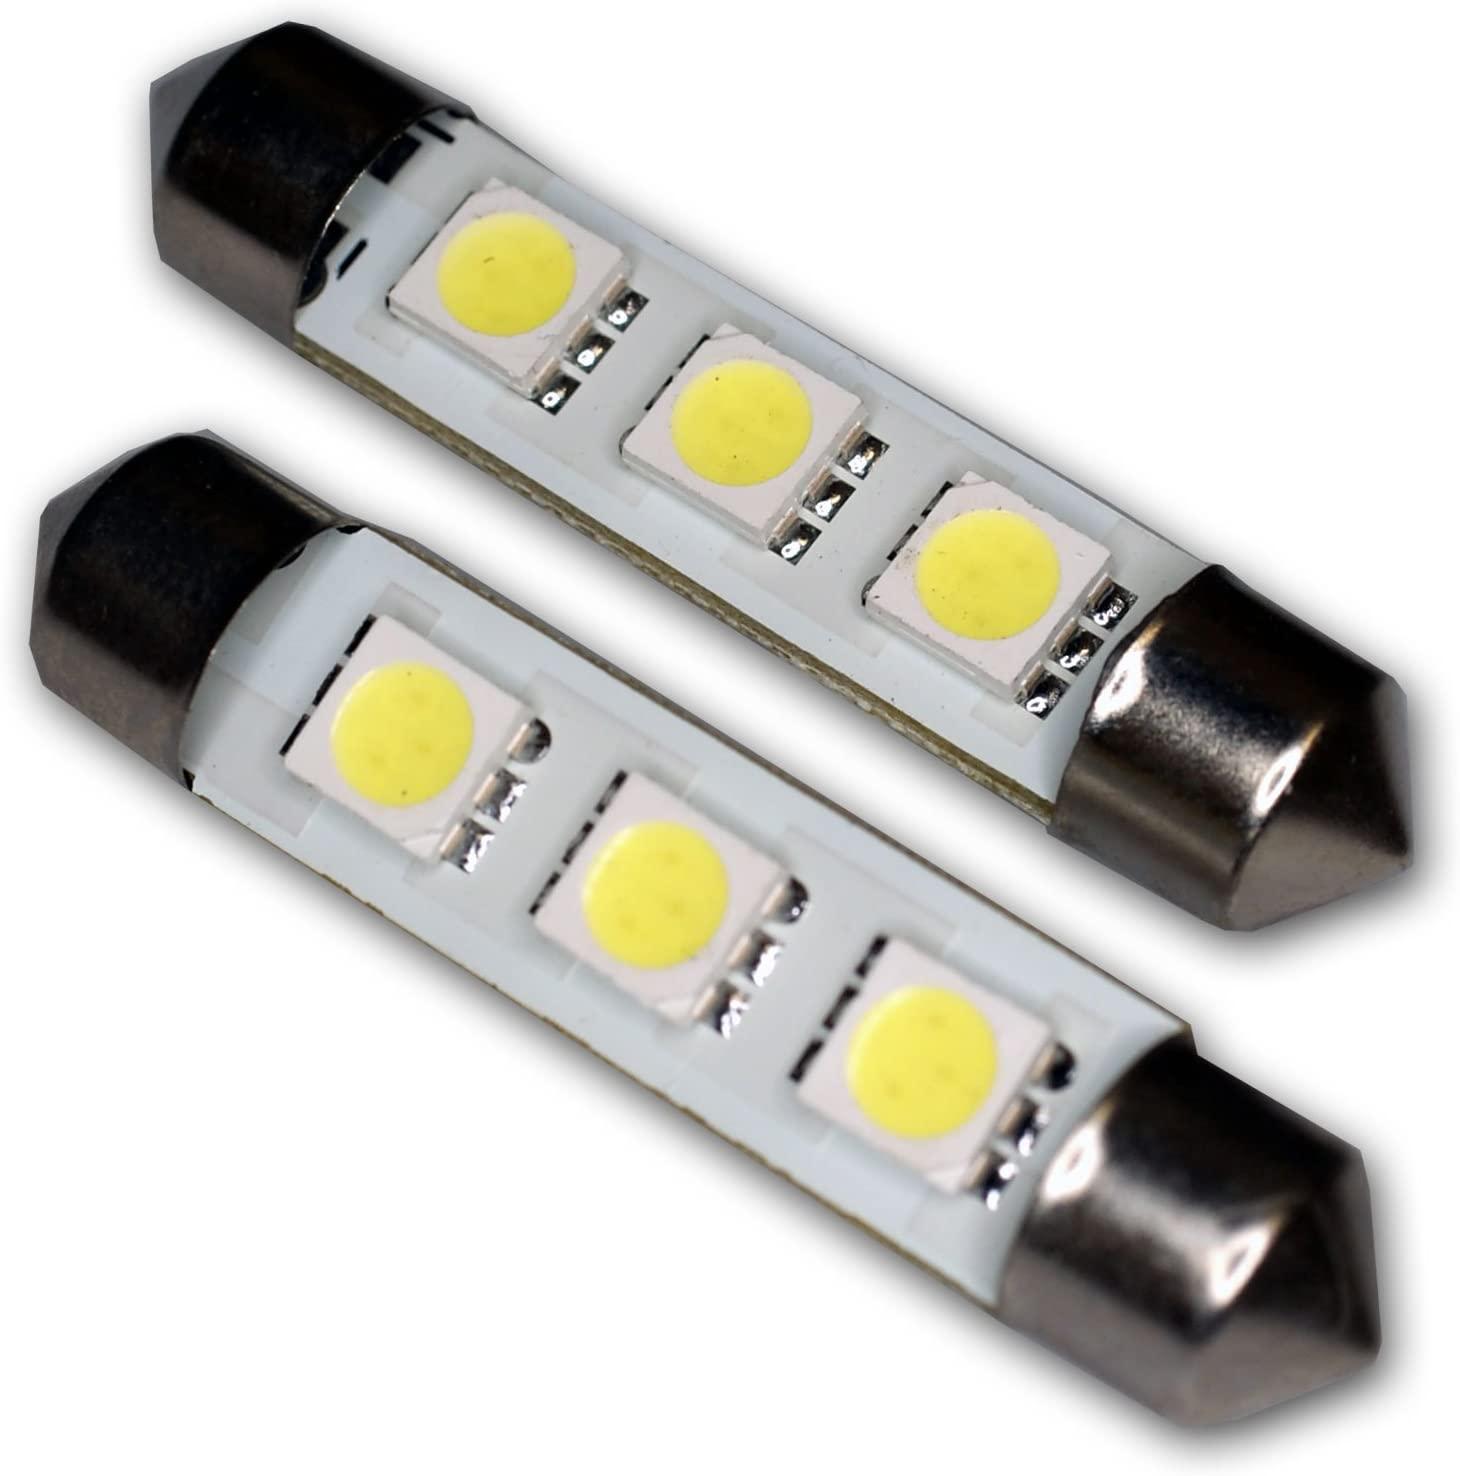 TuningPros LEDDL-42M-WS3 Dome Light LED Light Bulbs Festoom 42mm, 3 SMD LED White 2-pc Set